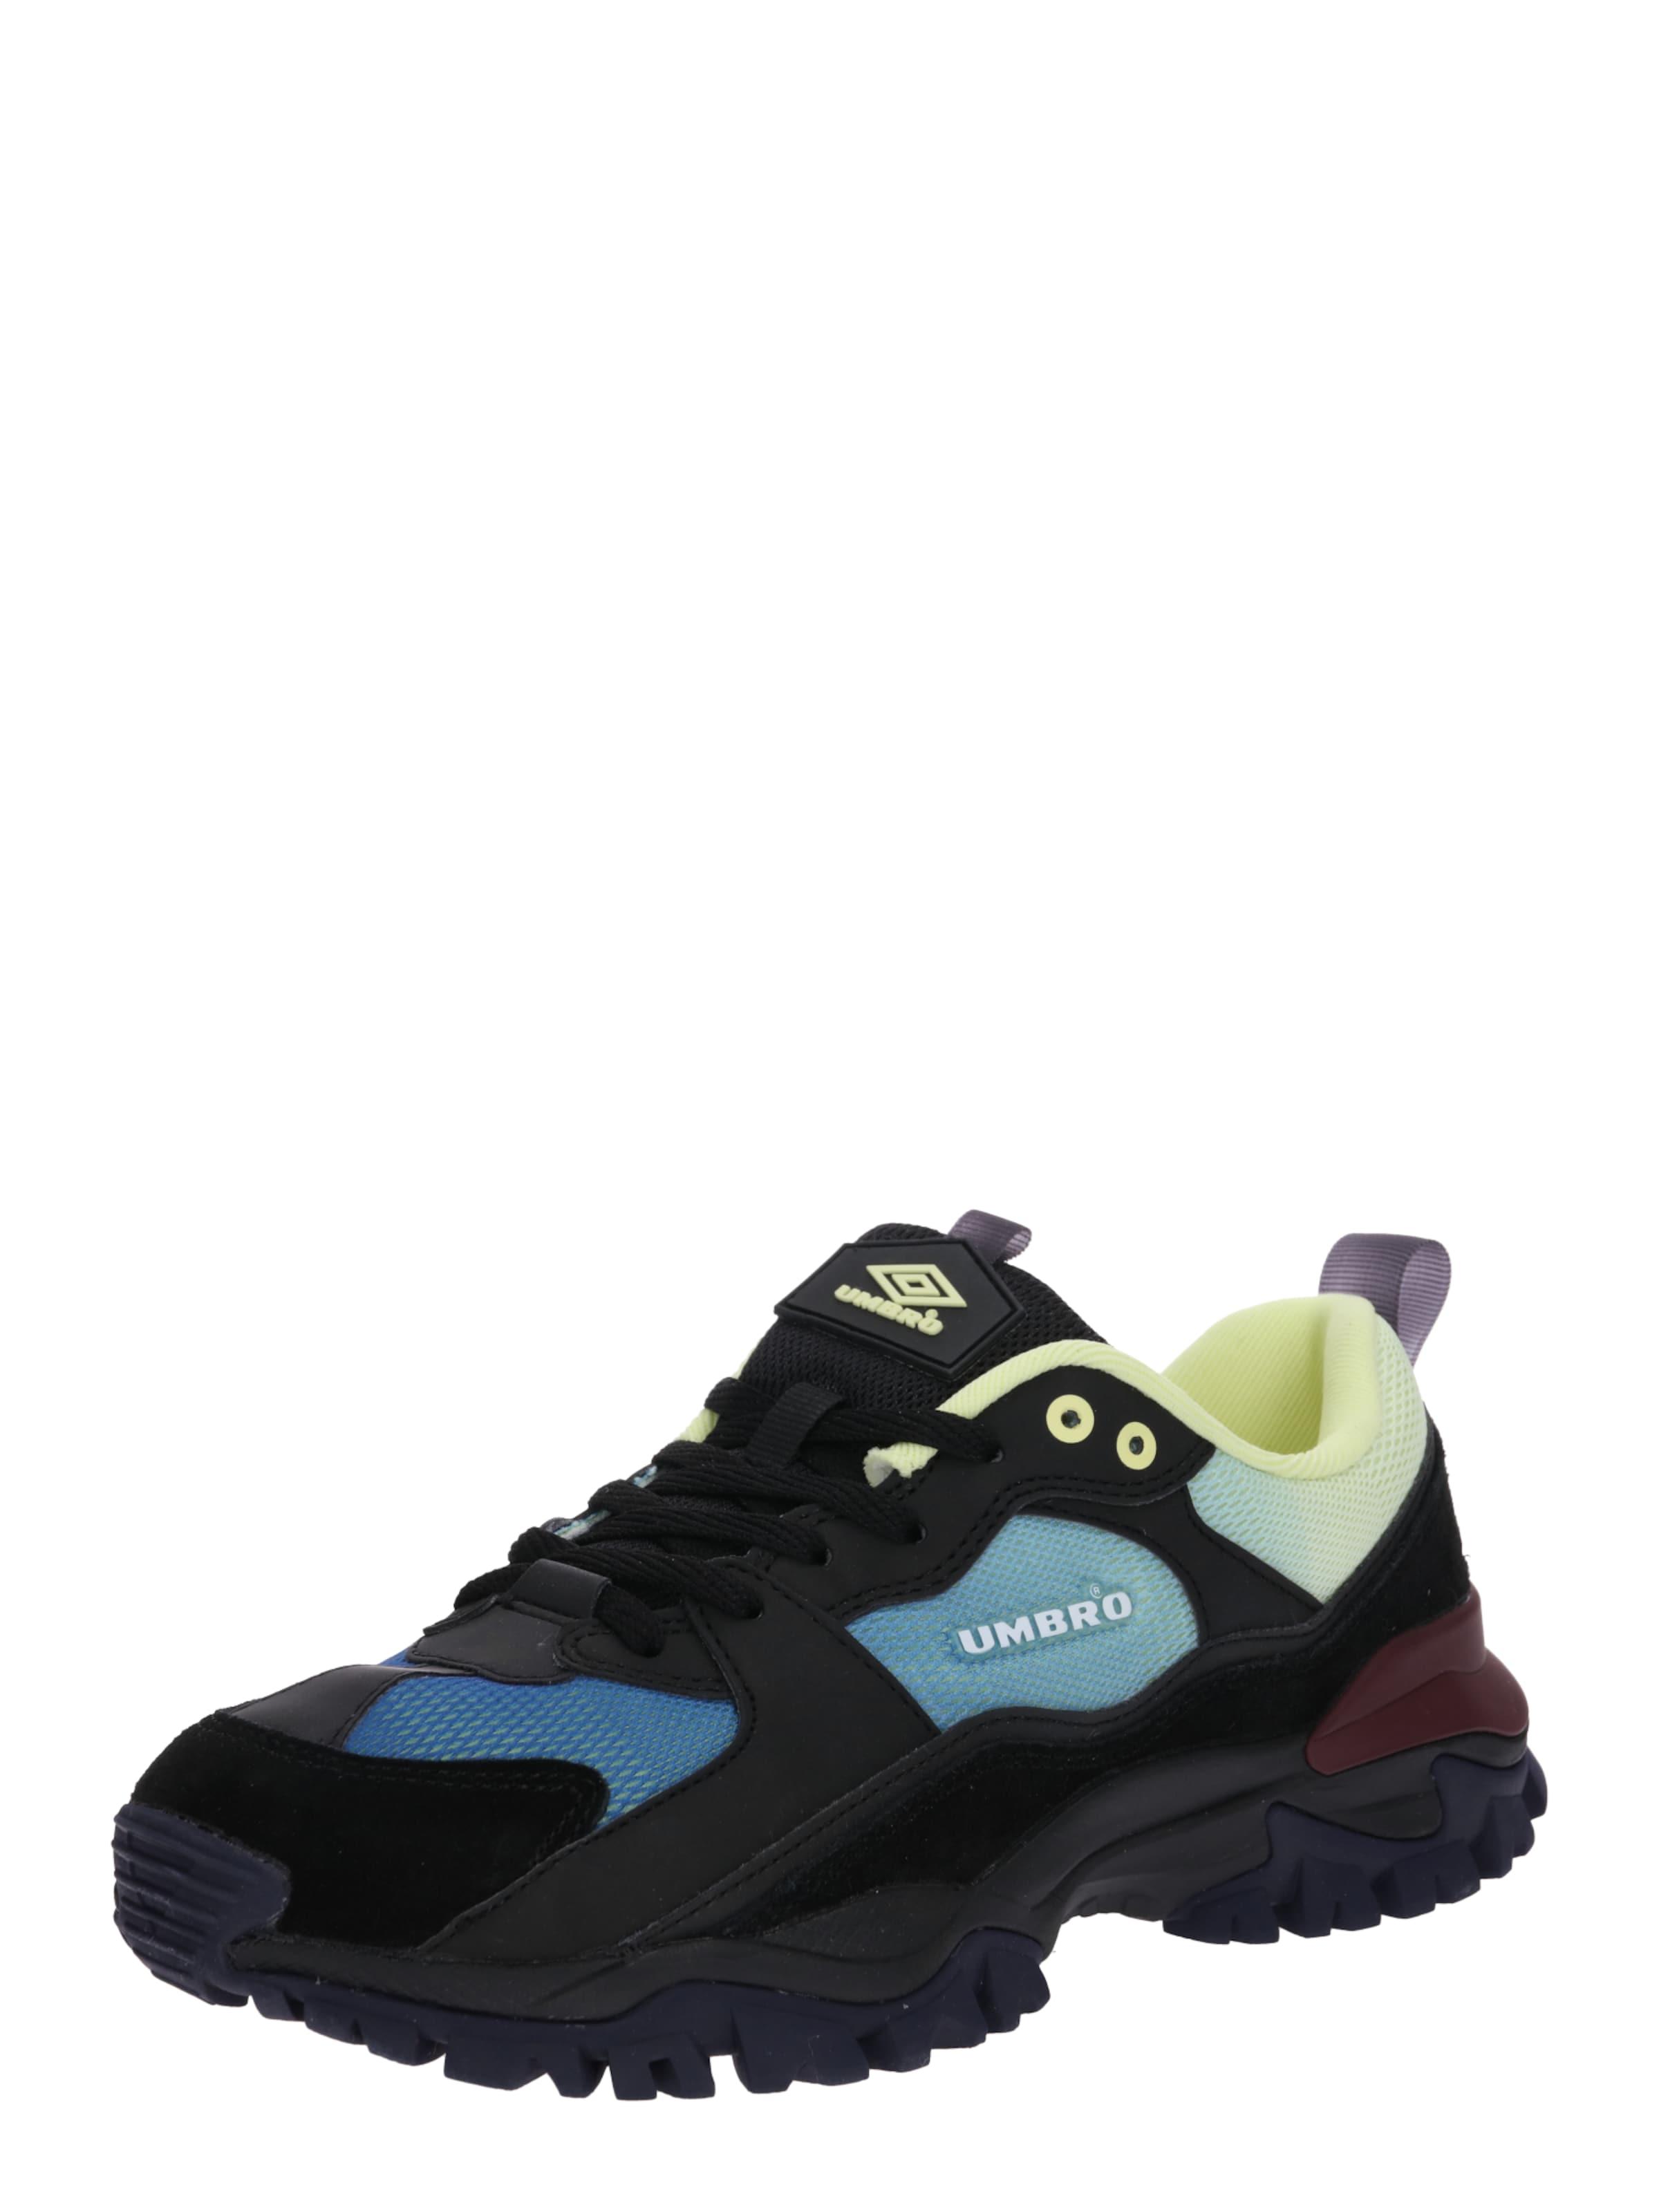 Umbro Laag Sneakers 'bumpy' In LichtblauwZwart 3ARj54L